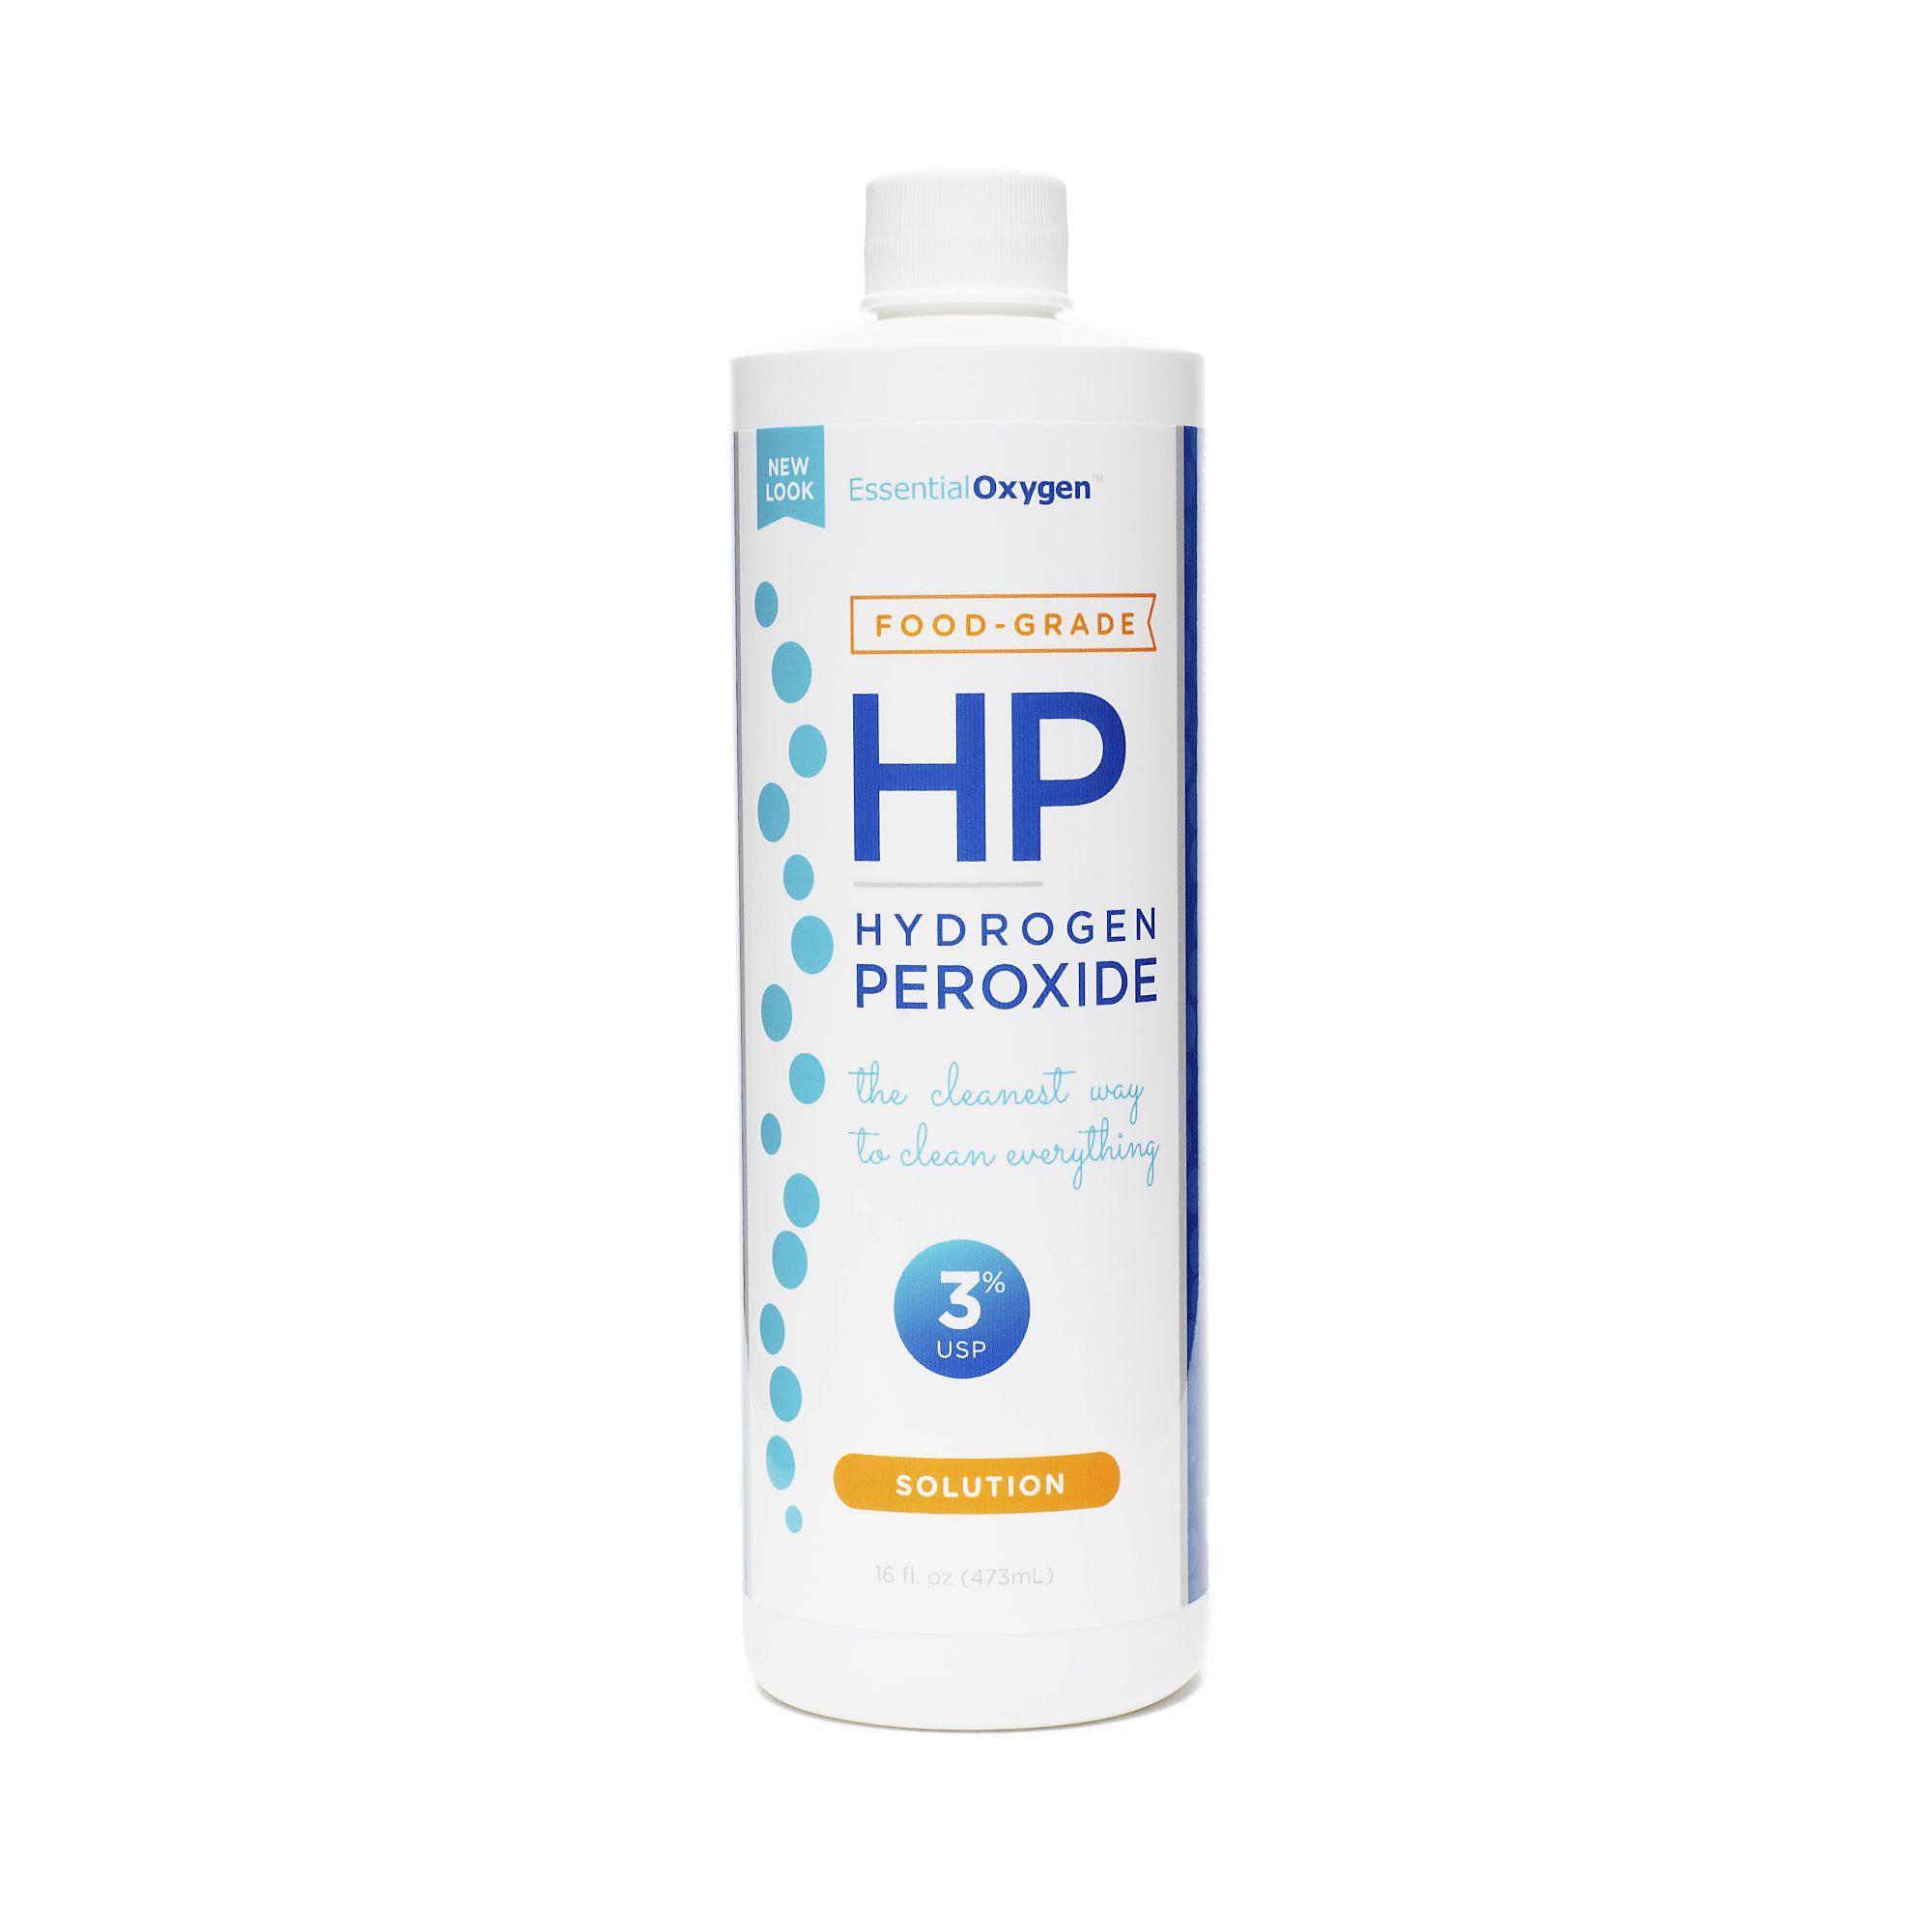 3 Food Grade Hydrogen Peroxide Food Grade Hydrogen Peroxide Hydrogen Peroxide Food Grade